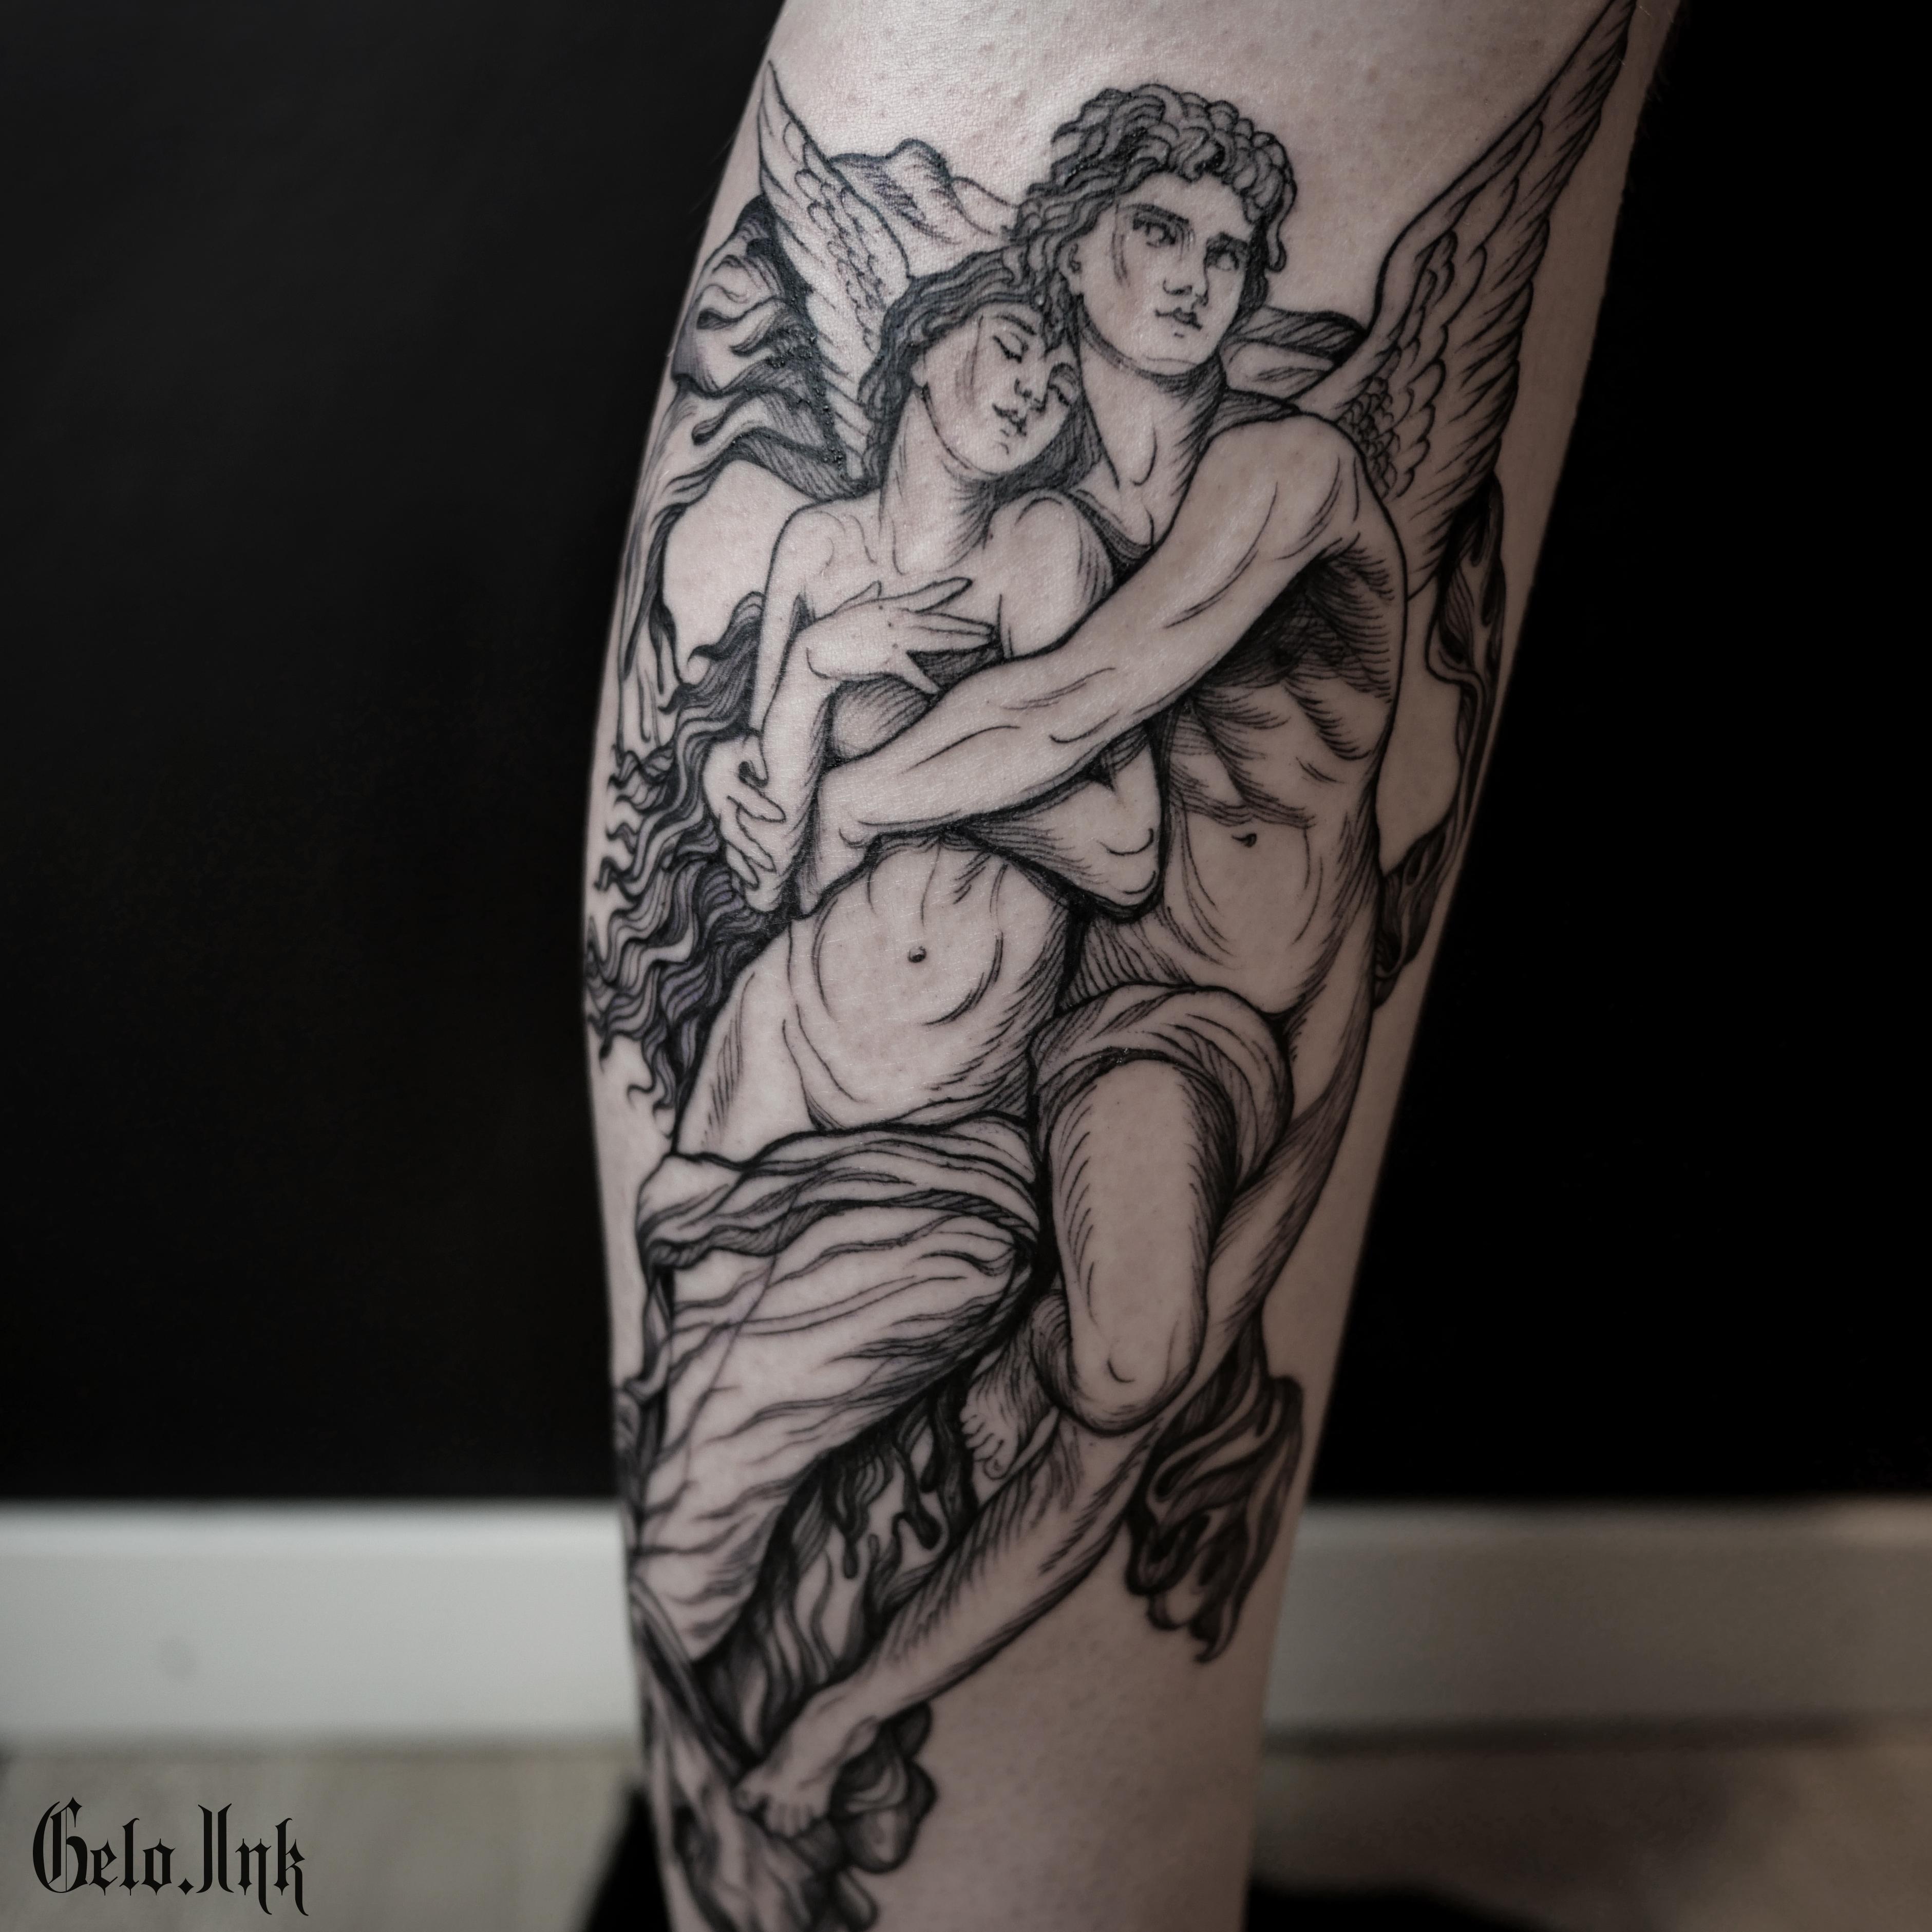 Inksearch tattoo Angelina